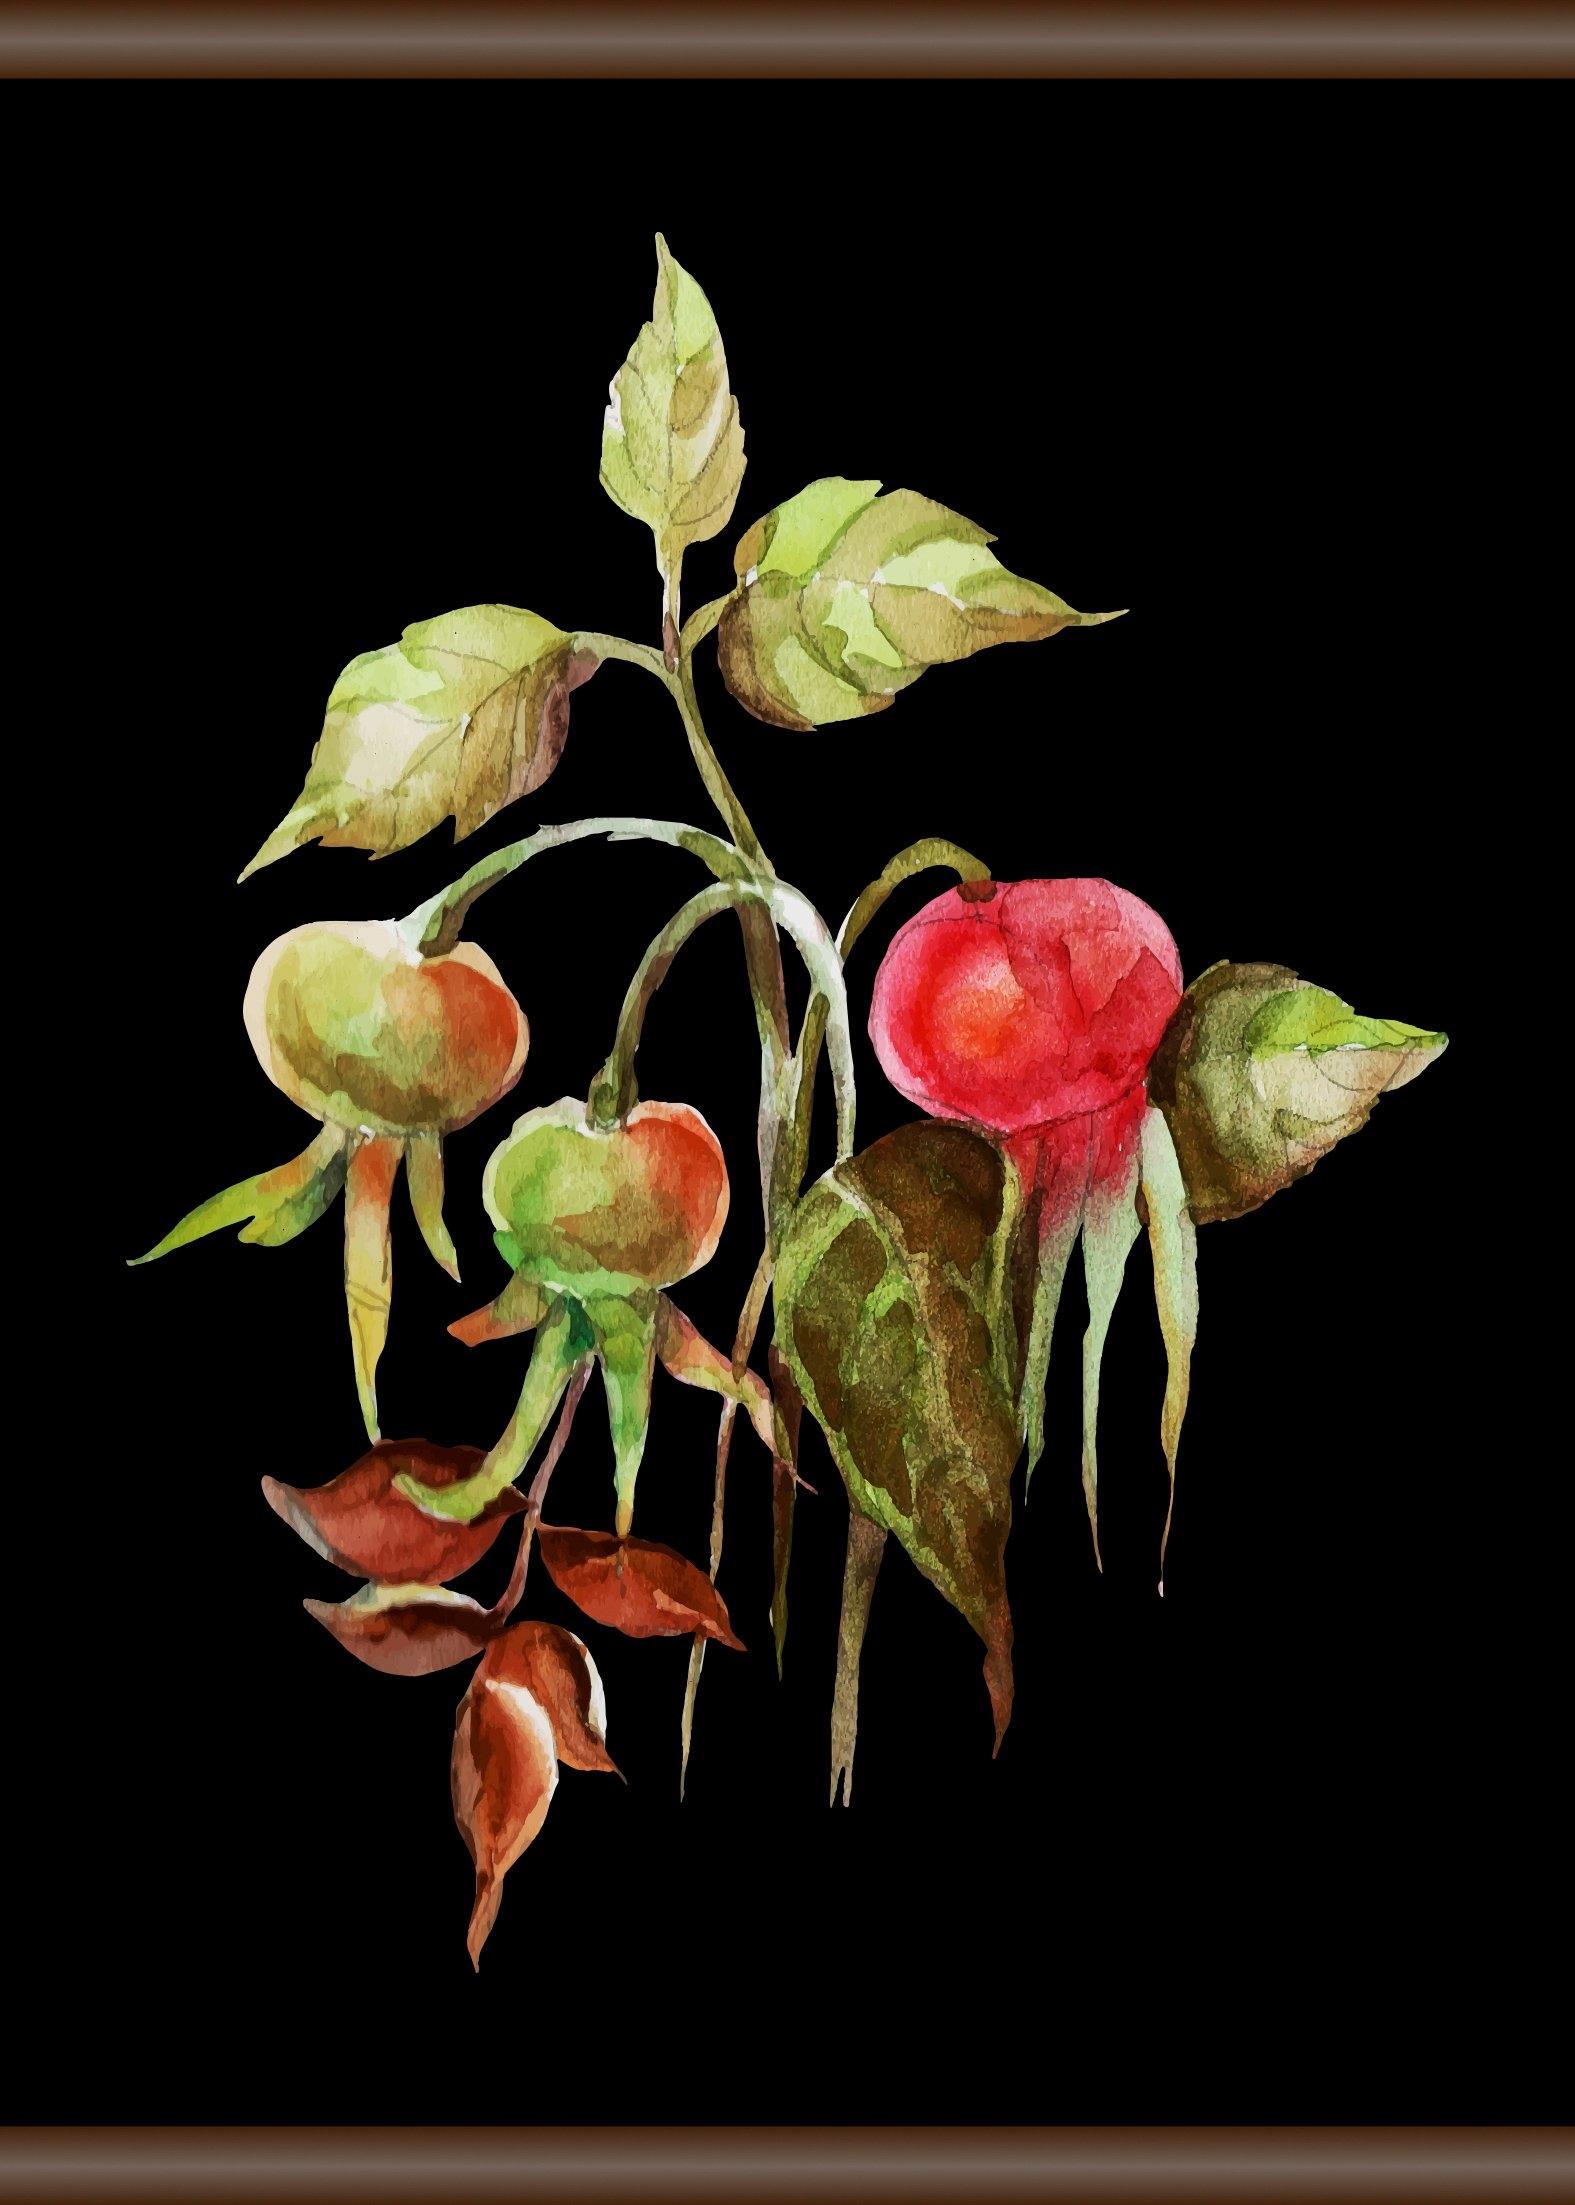 queence Linnen »rozenbottel«, Screen scroll schilderij 50x70 cm - verschillende betaalmethodes